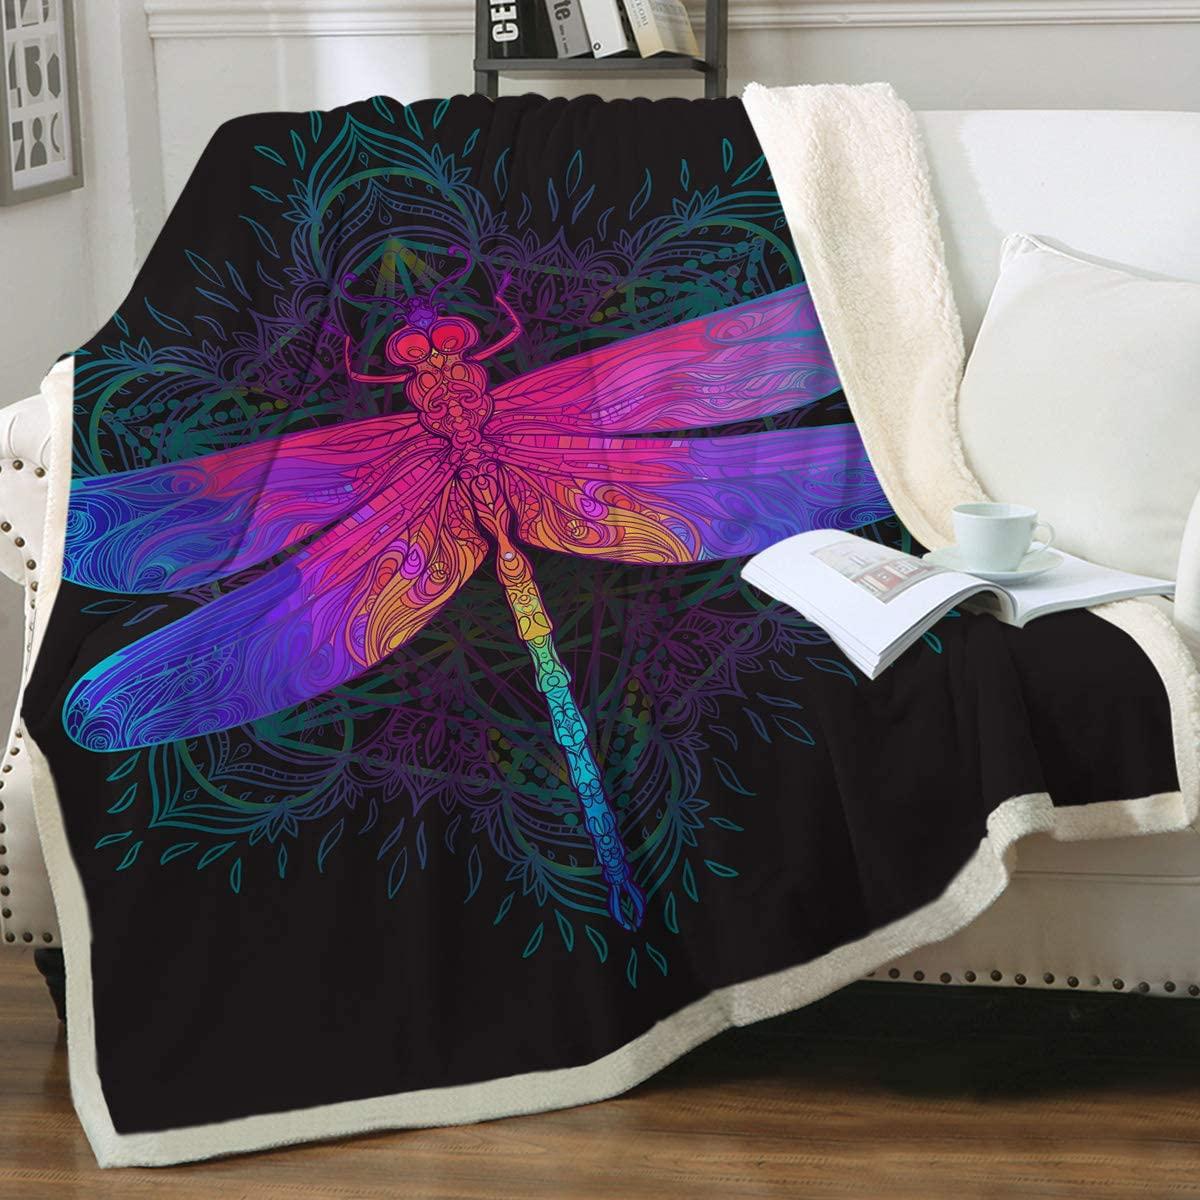 Sleepwish Dragonfly Fleece Throw Blanket Neon Blue Purple Pink Dragonfly Blankets Boho Insect Print Sherpa Blanket for Kids Teens Adults